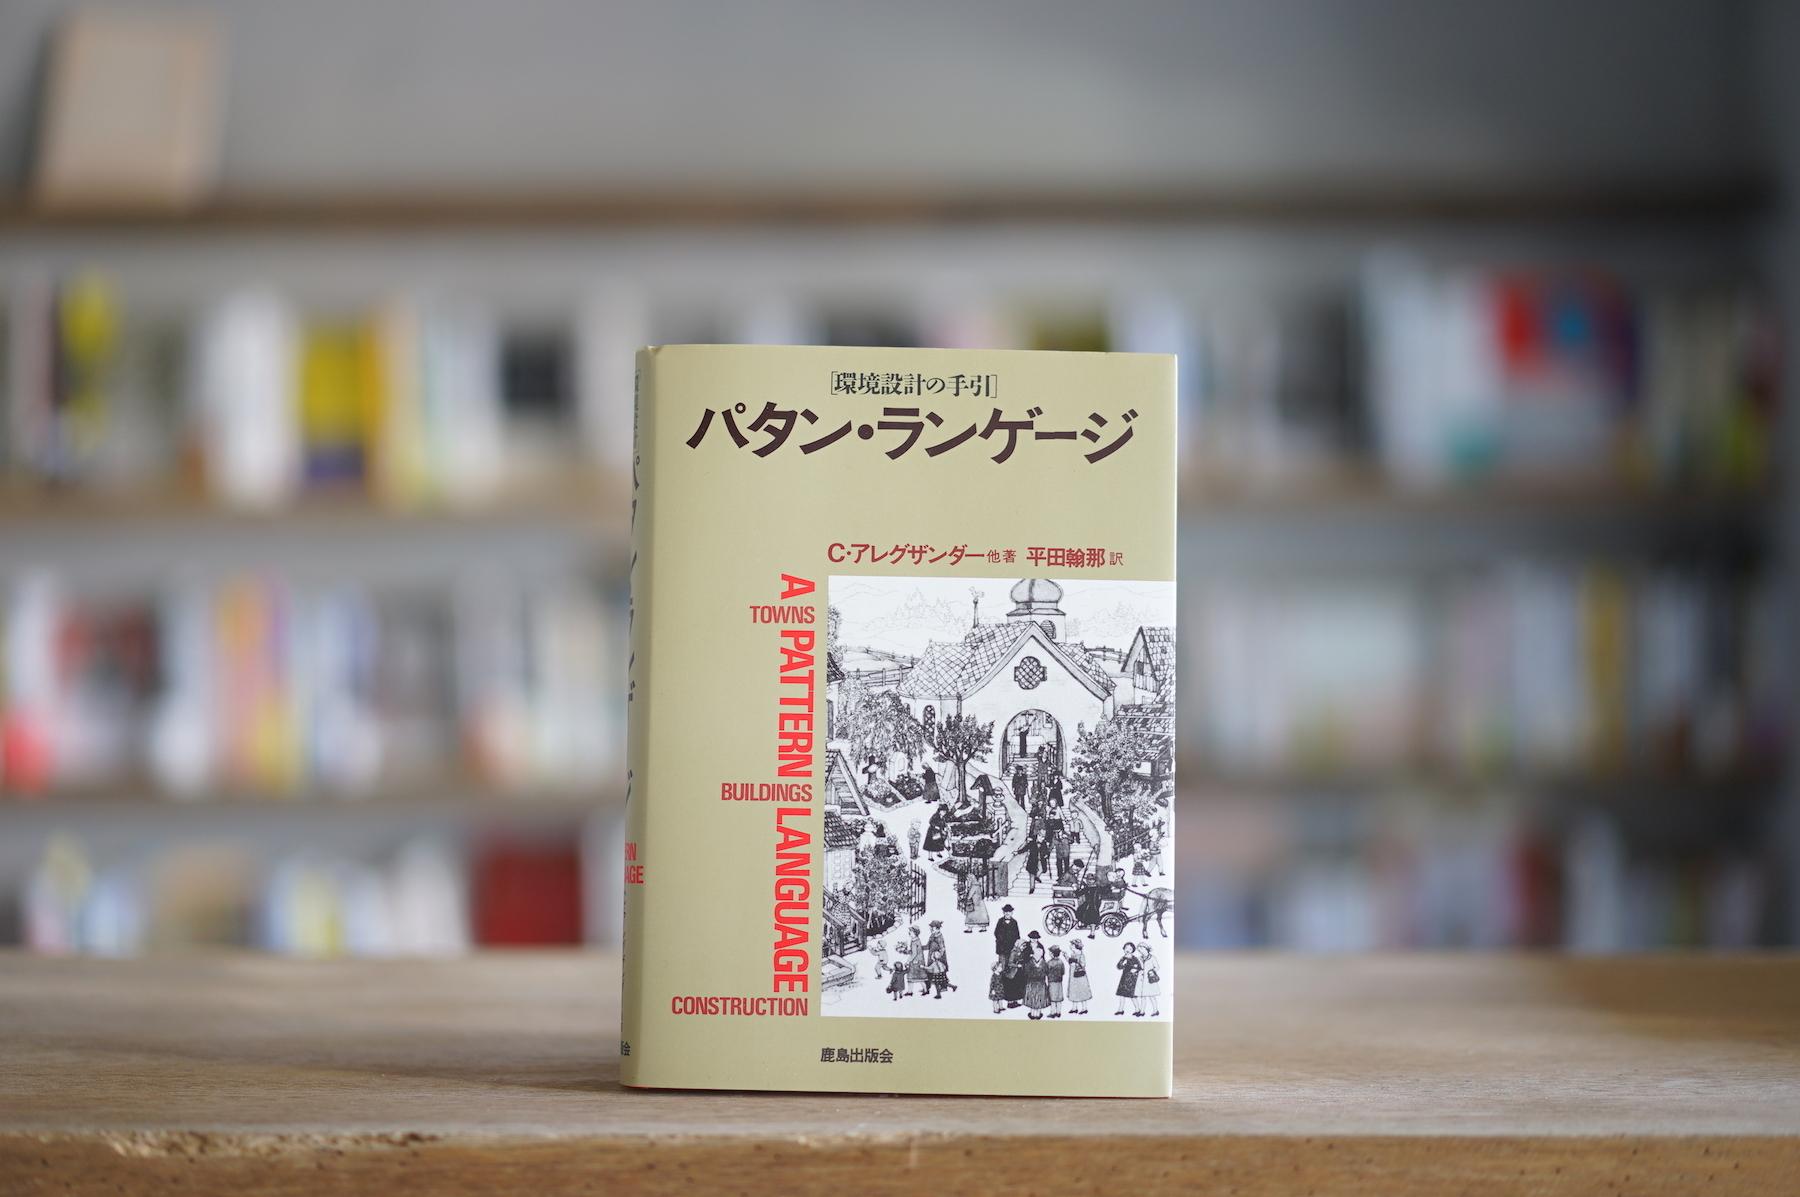 C・アレグザンダー他 訳:平田翰那 『パタン・ランゲージ』 (鹿島出版会、1984)